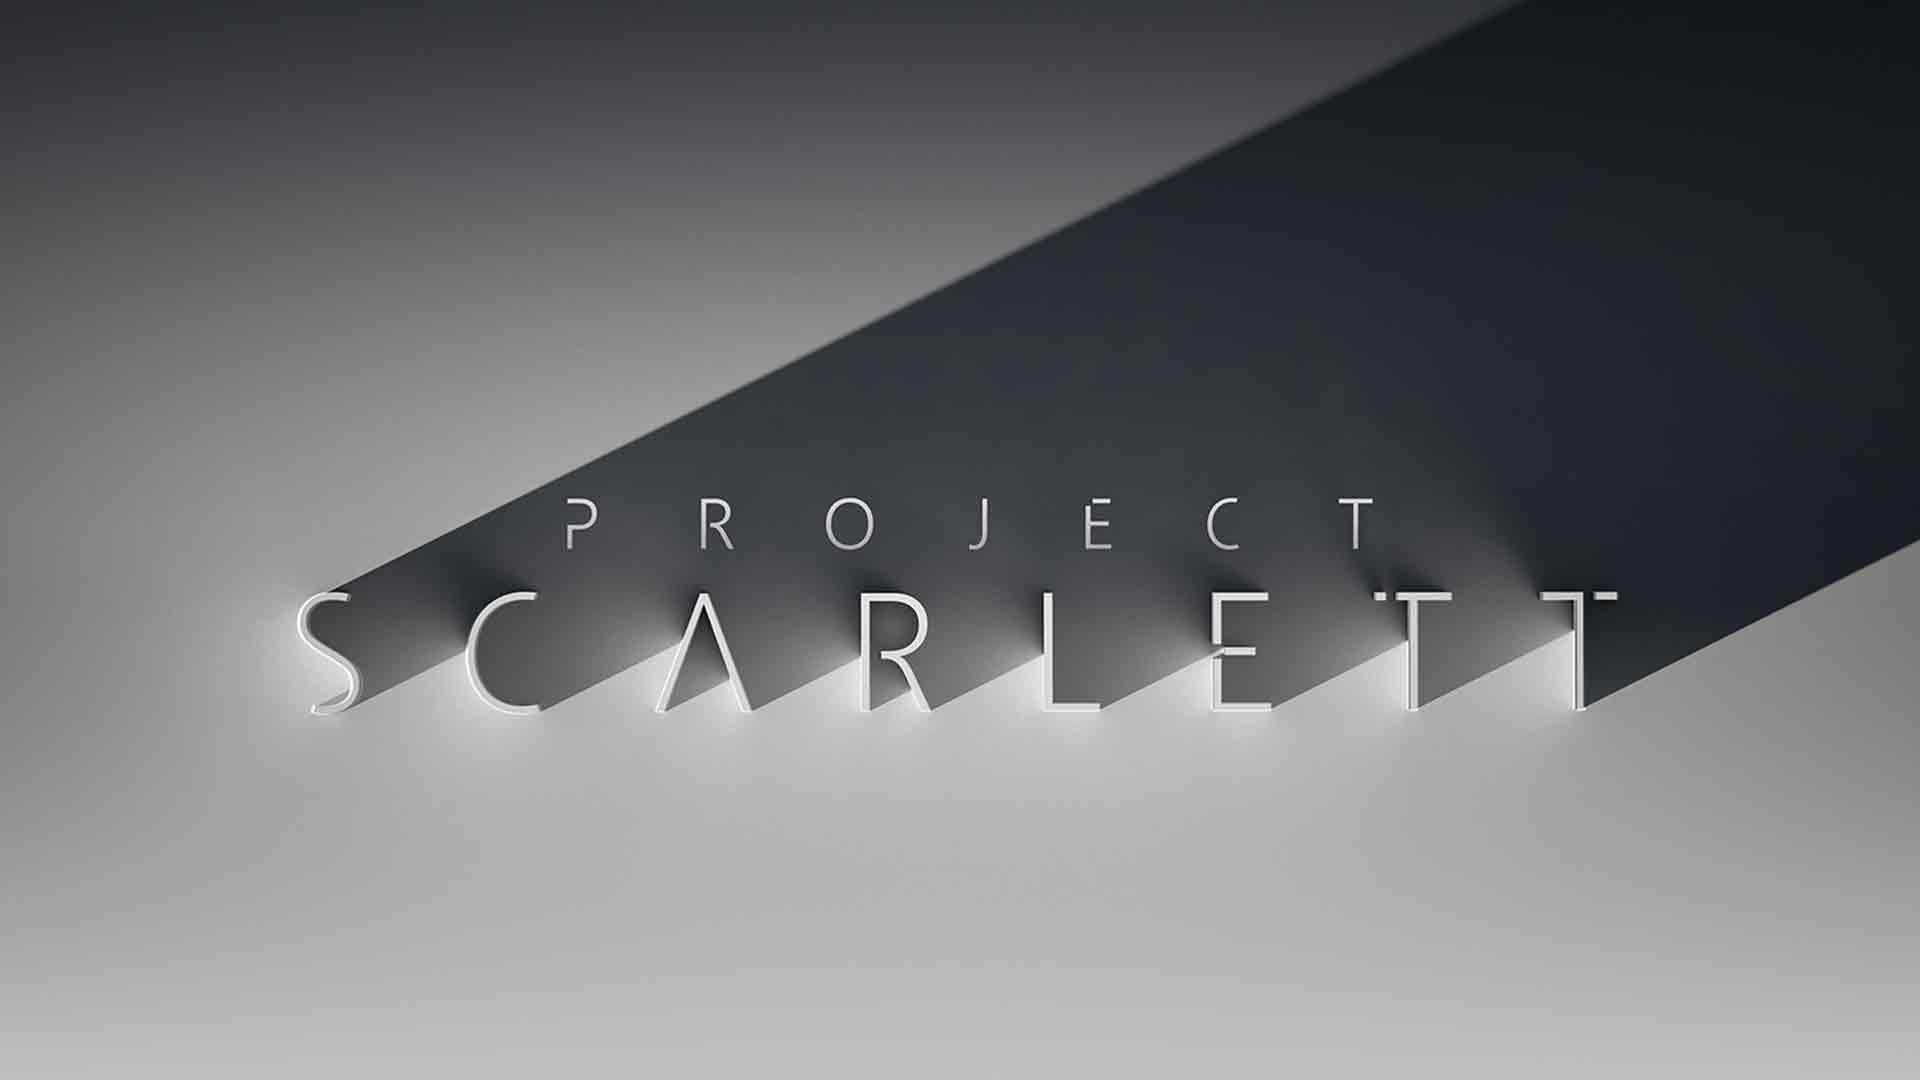 Xbox Scarlett 8k res